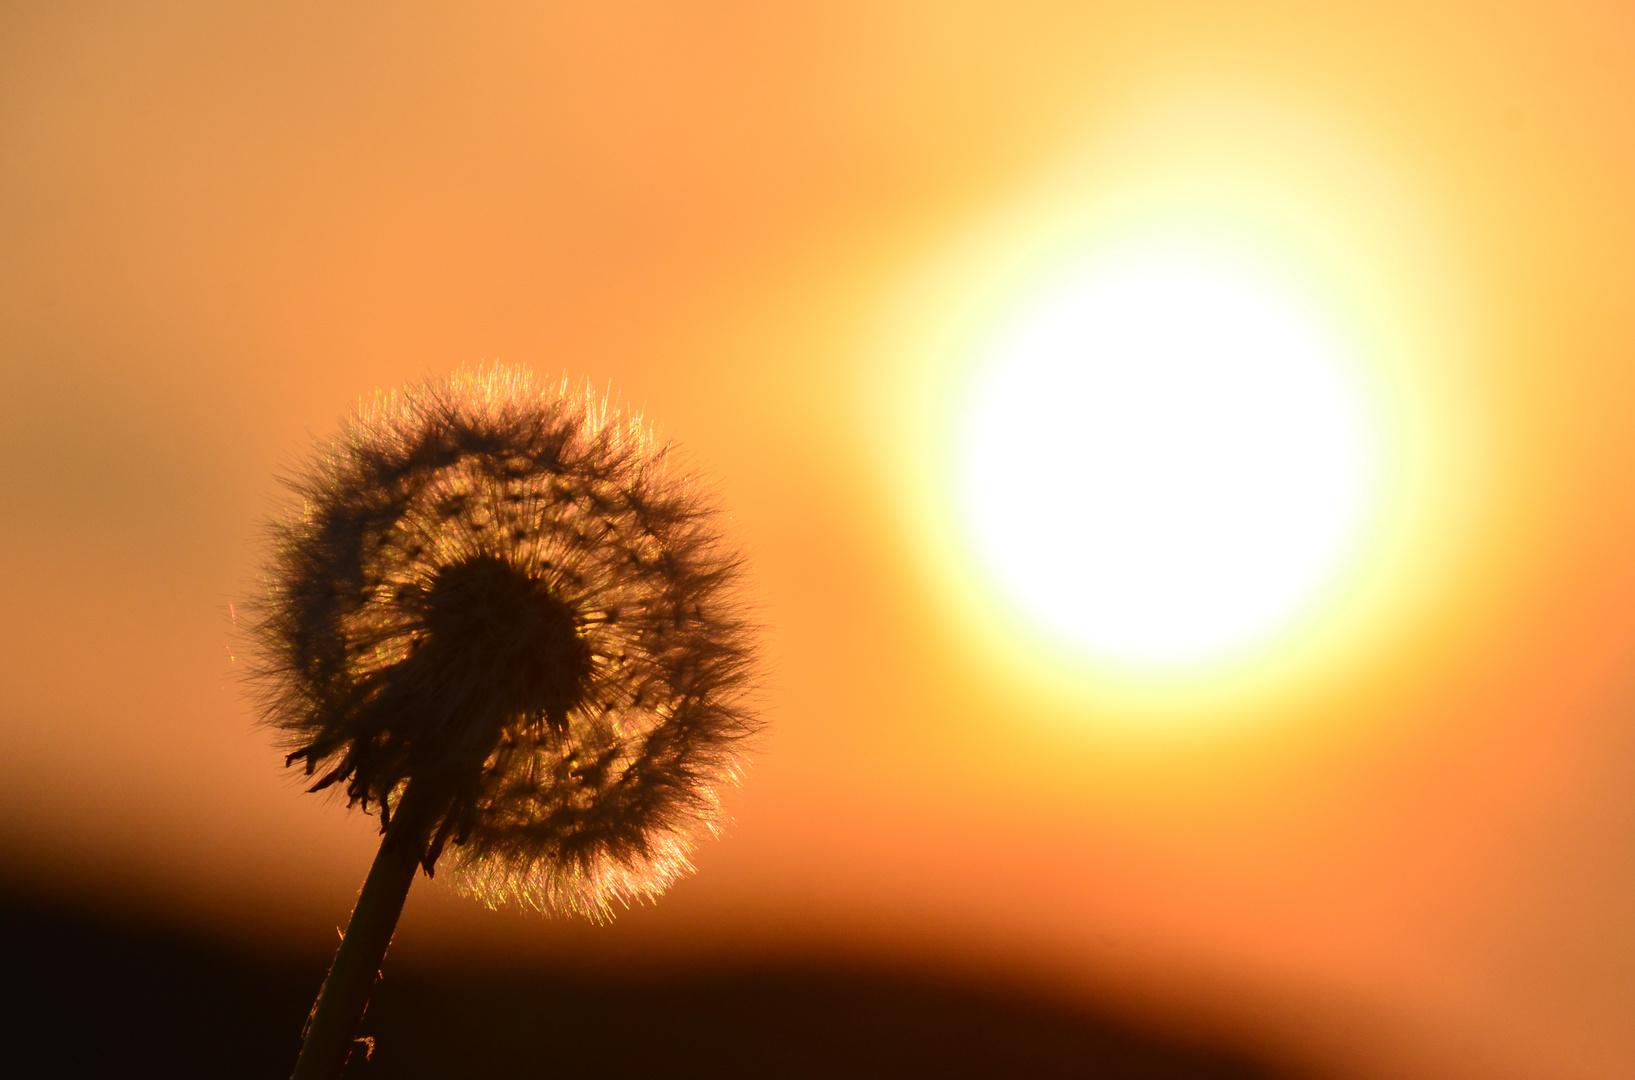 Sonnenanbeter